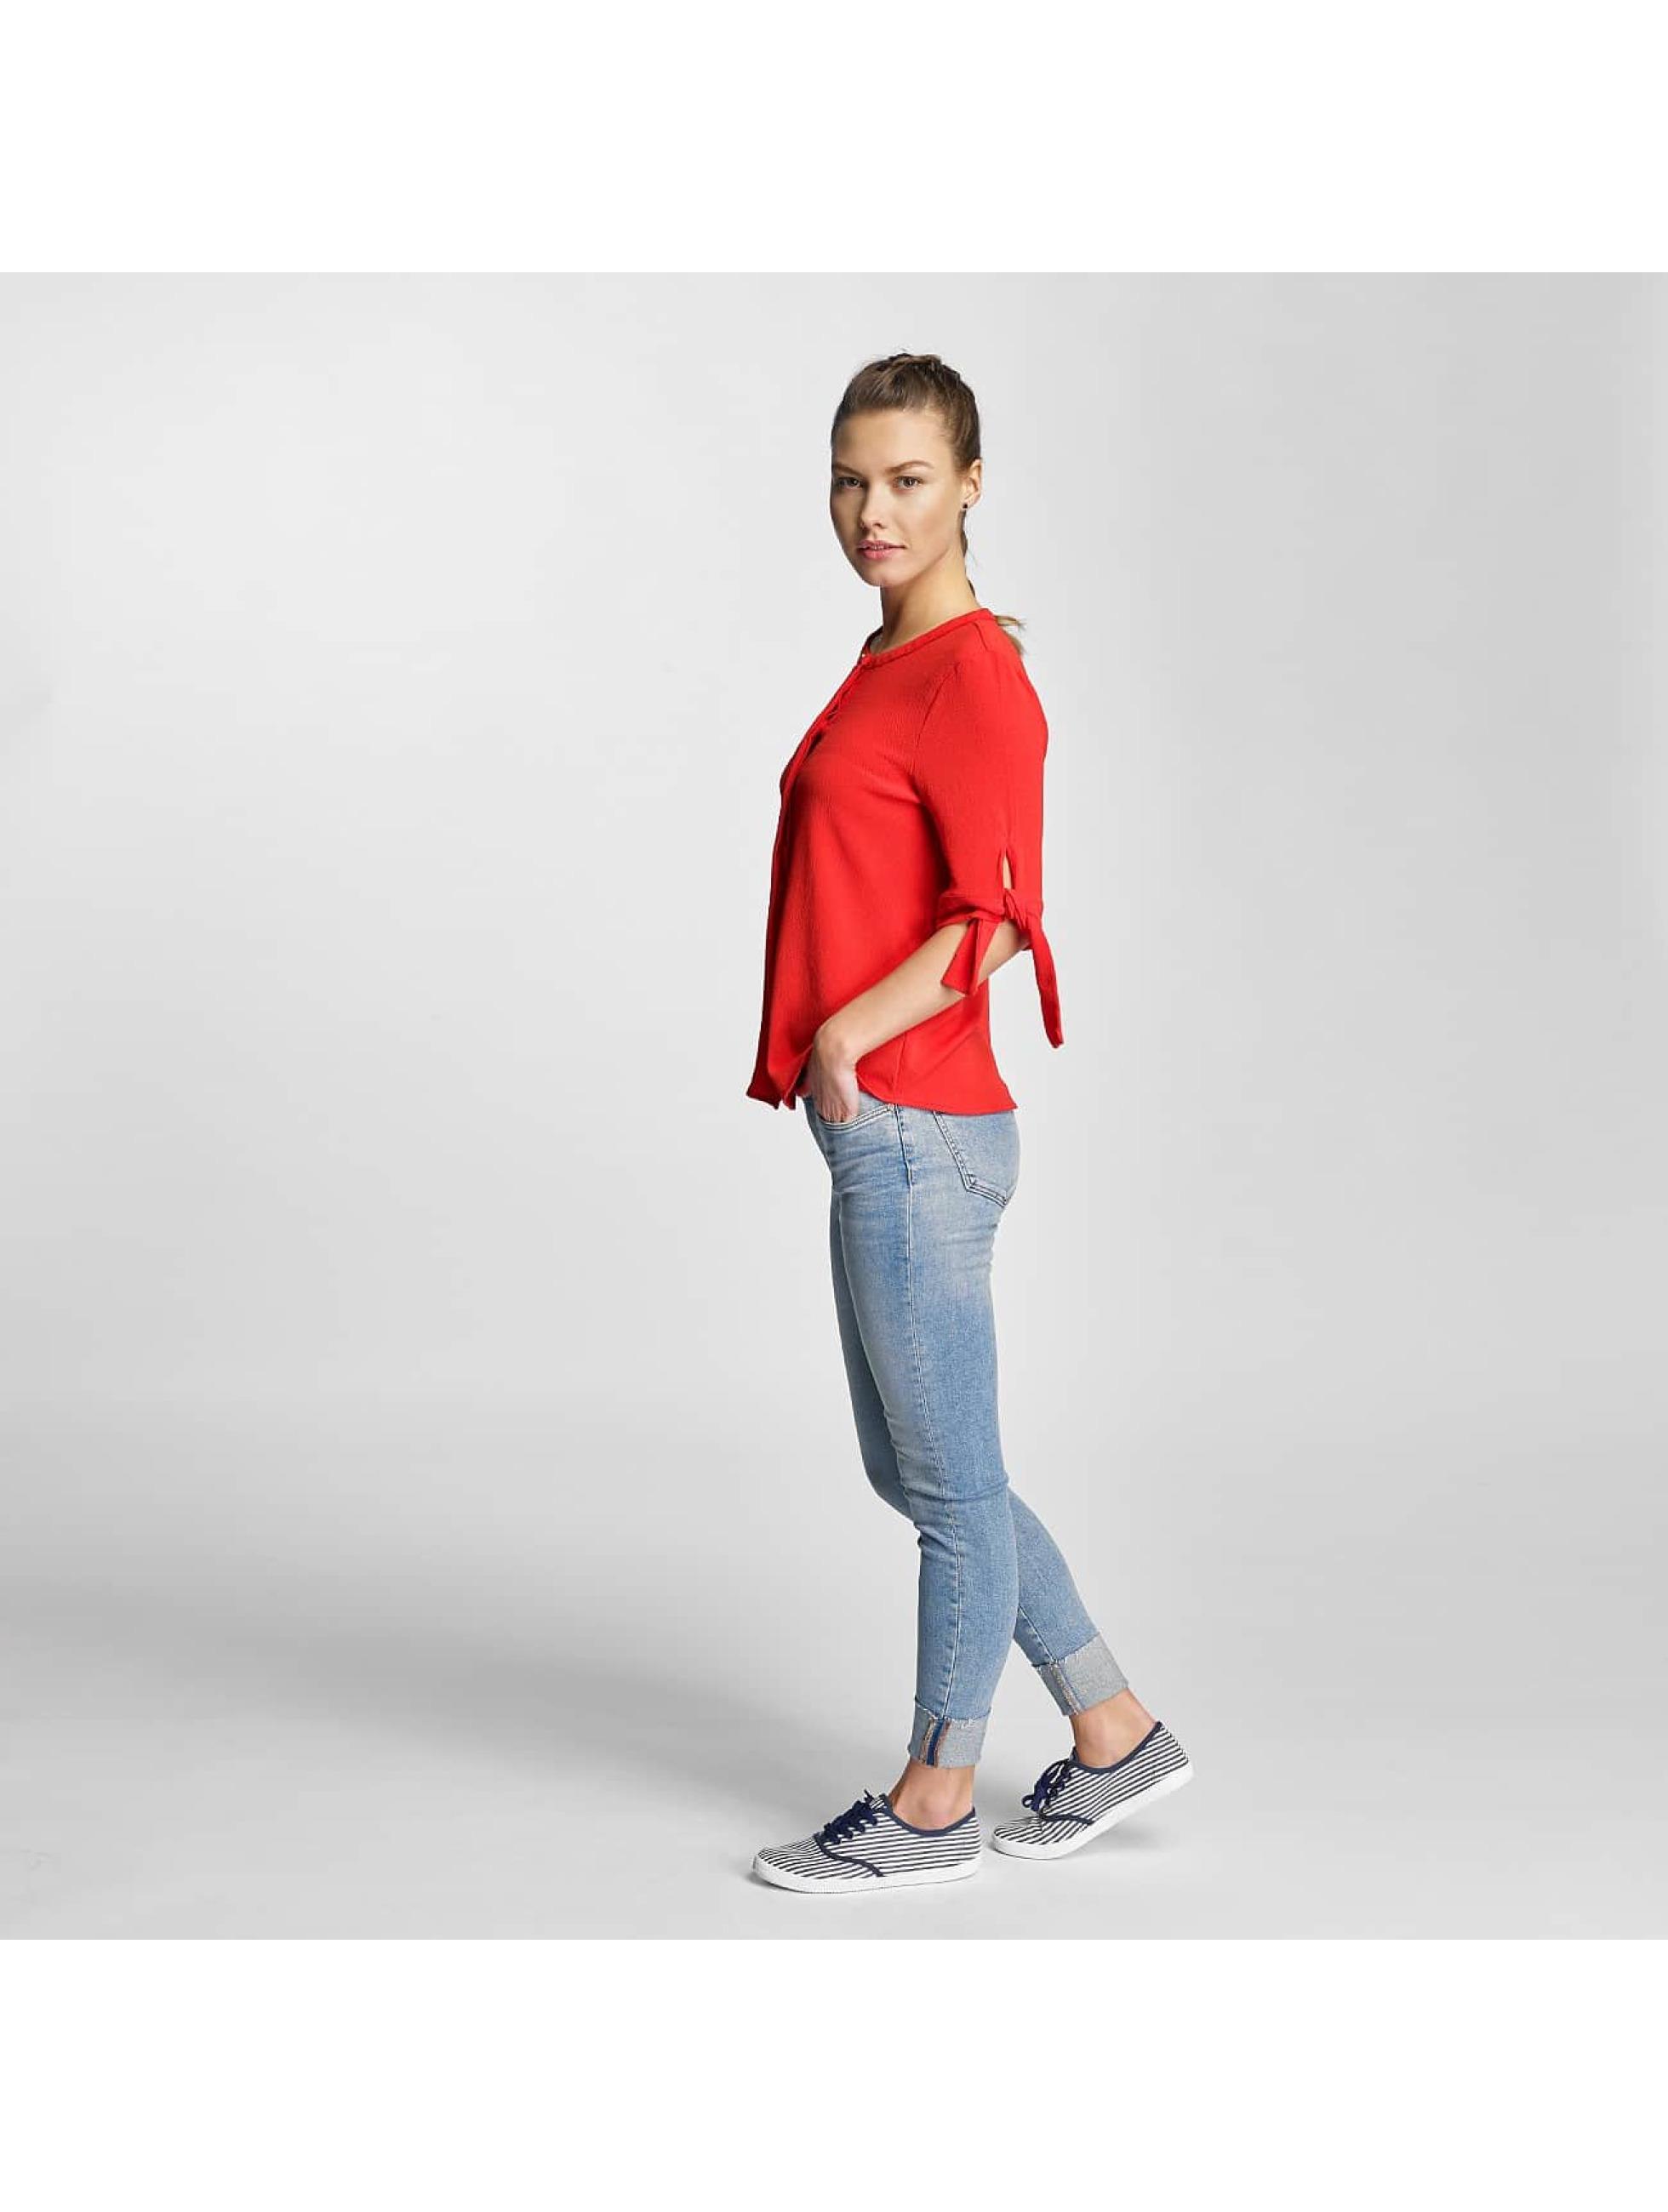 Vero Moda Blus/Tunika VmGertrud röd